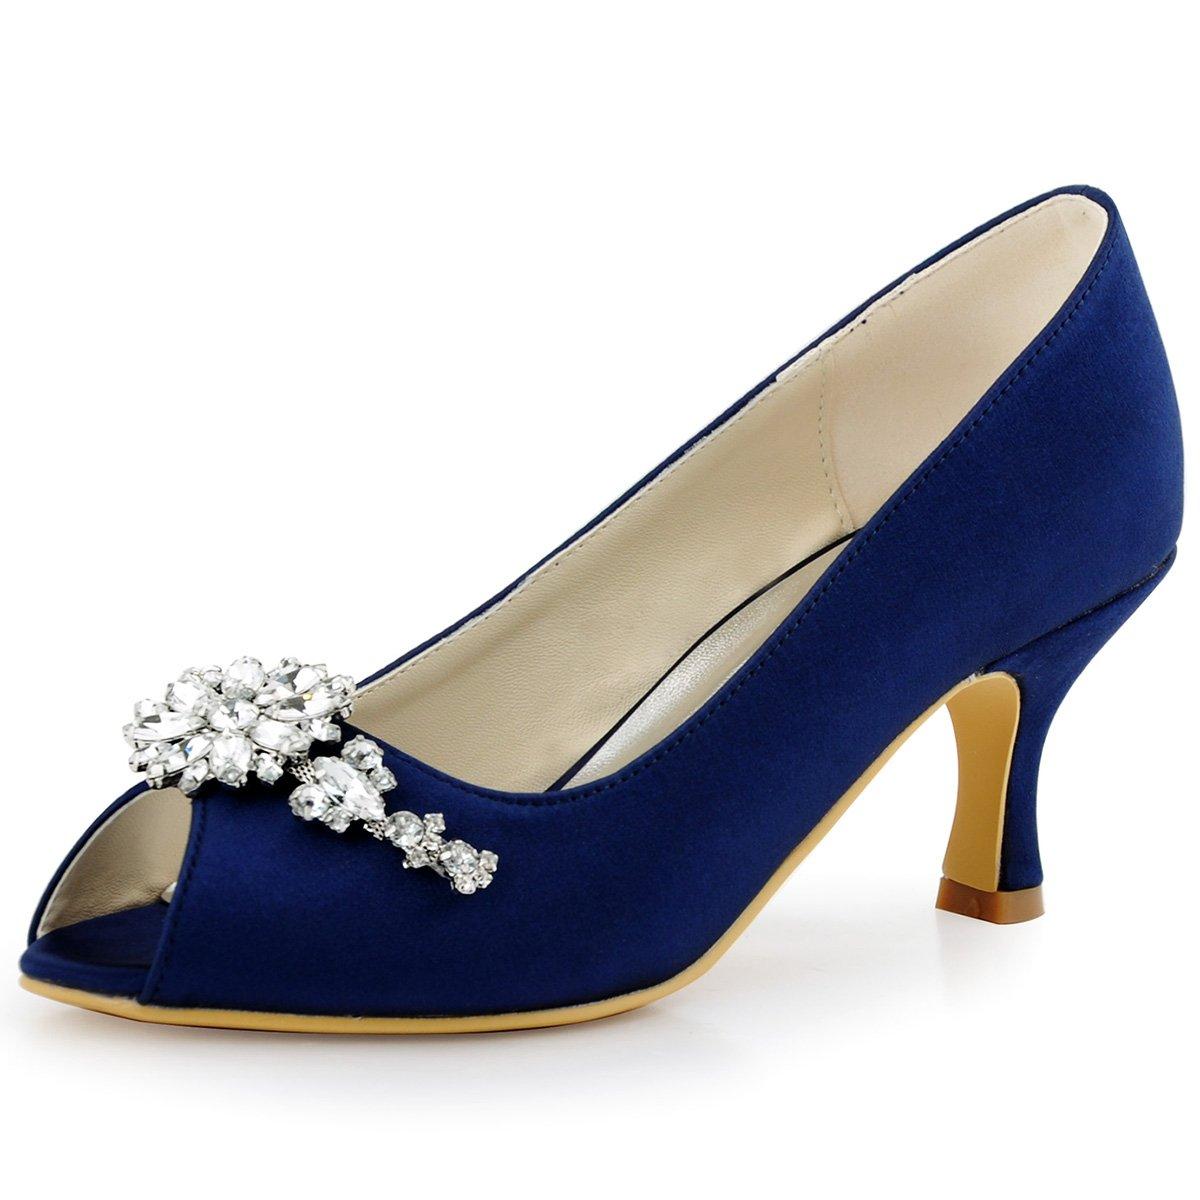 ElegantPark HP1541 Women Pumps Mid Heel Peep Toe Flower Rhinestones Satin Evening Prom Wedding Shoes Navy Blue US 8